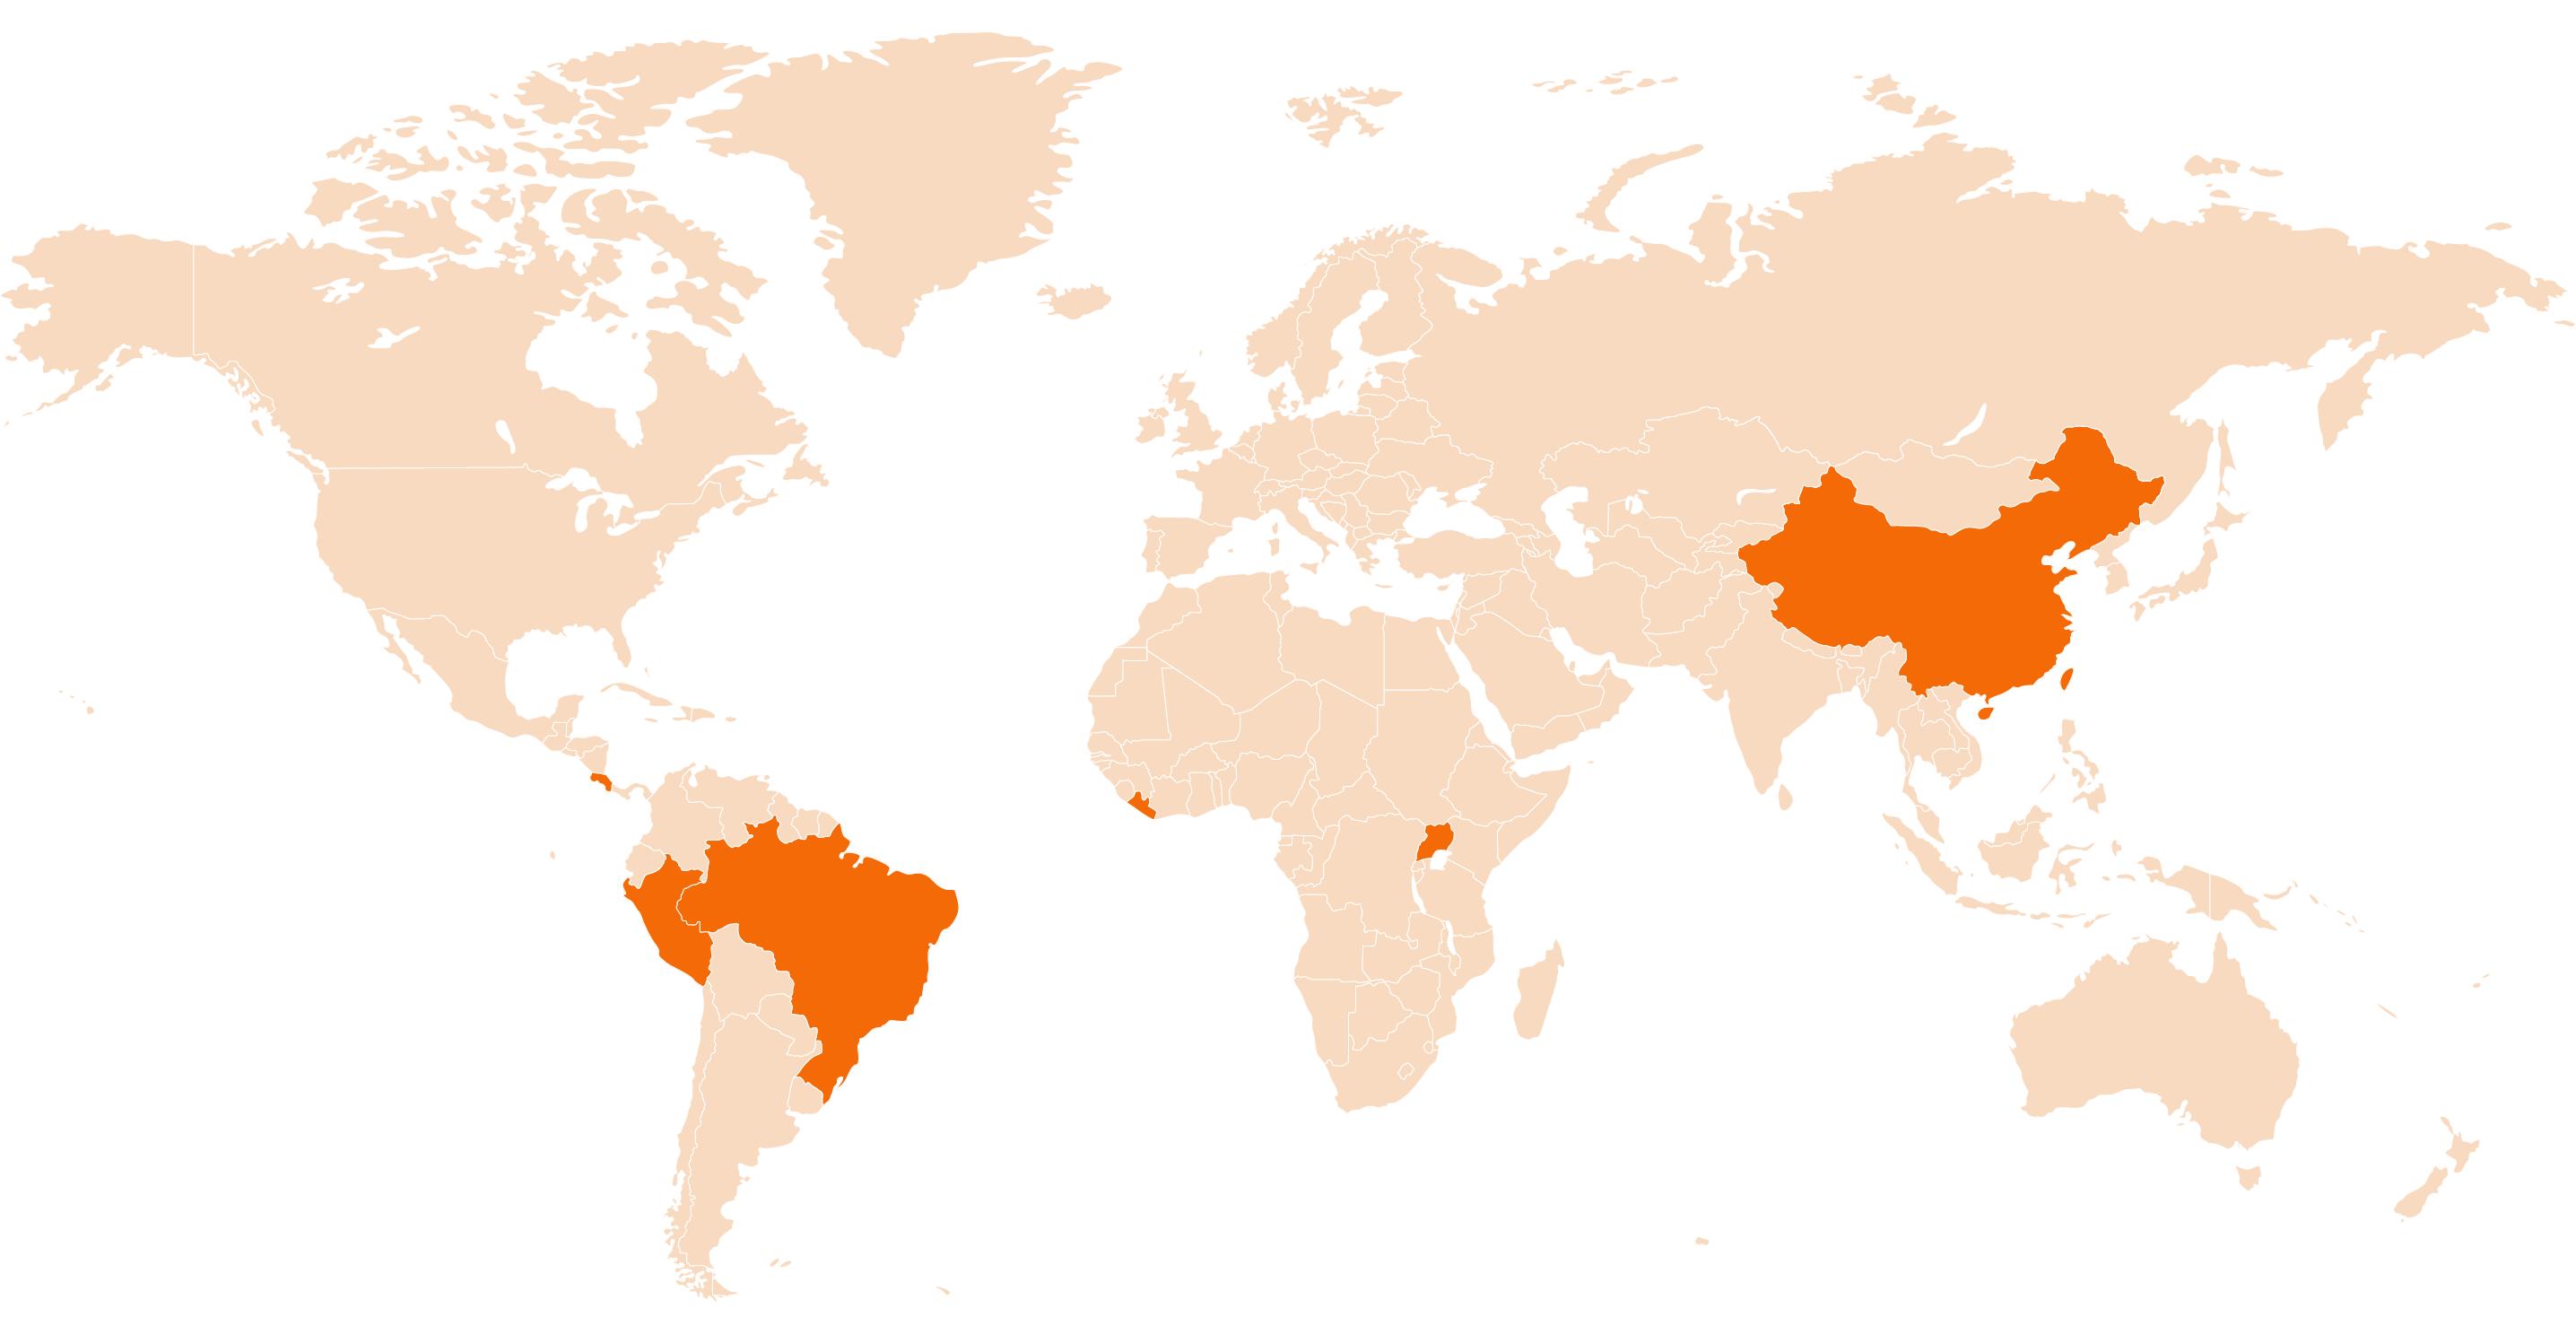 Metaketa Round 3 country locations